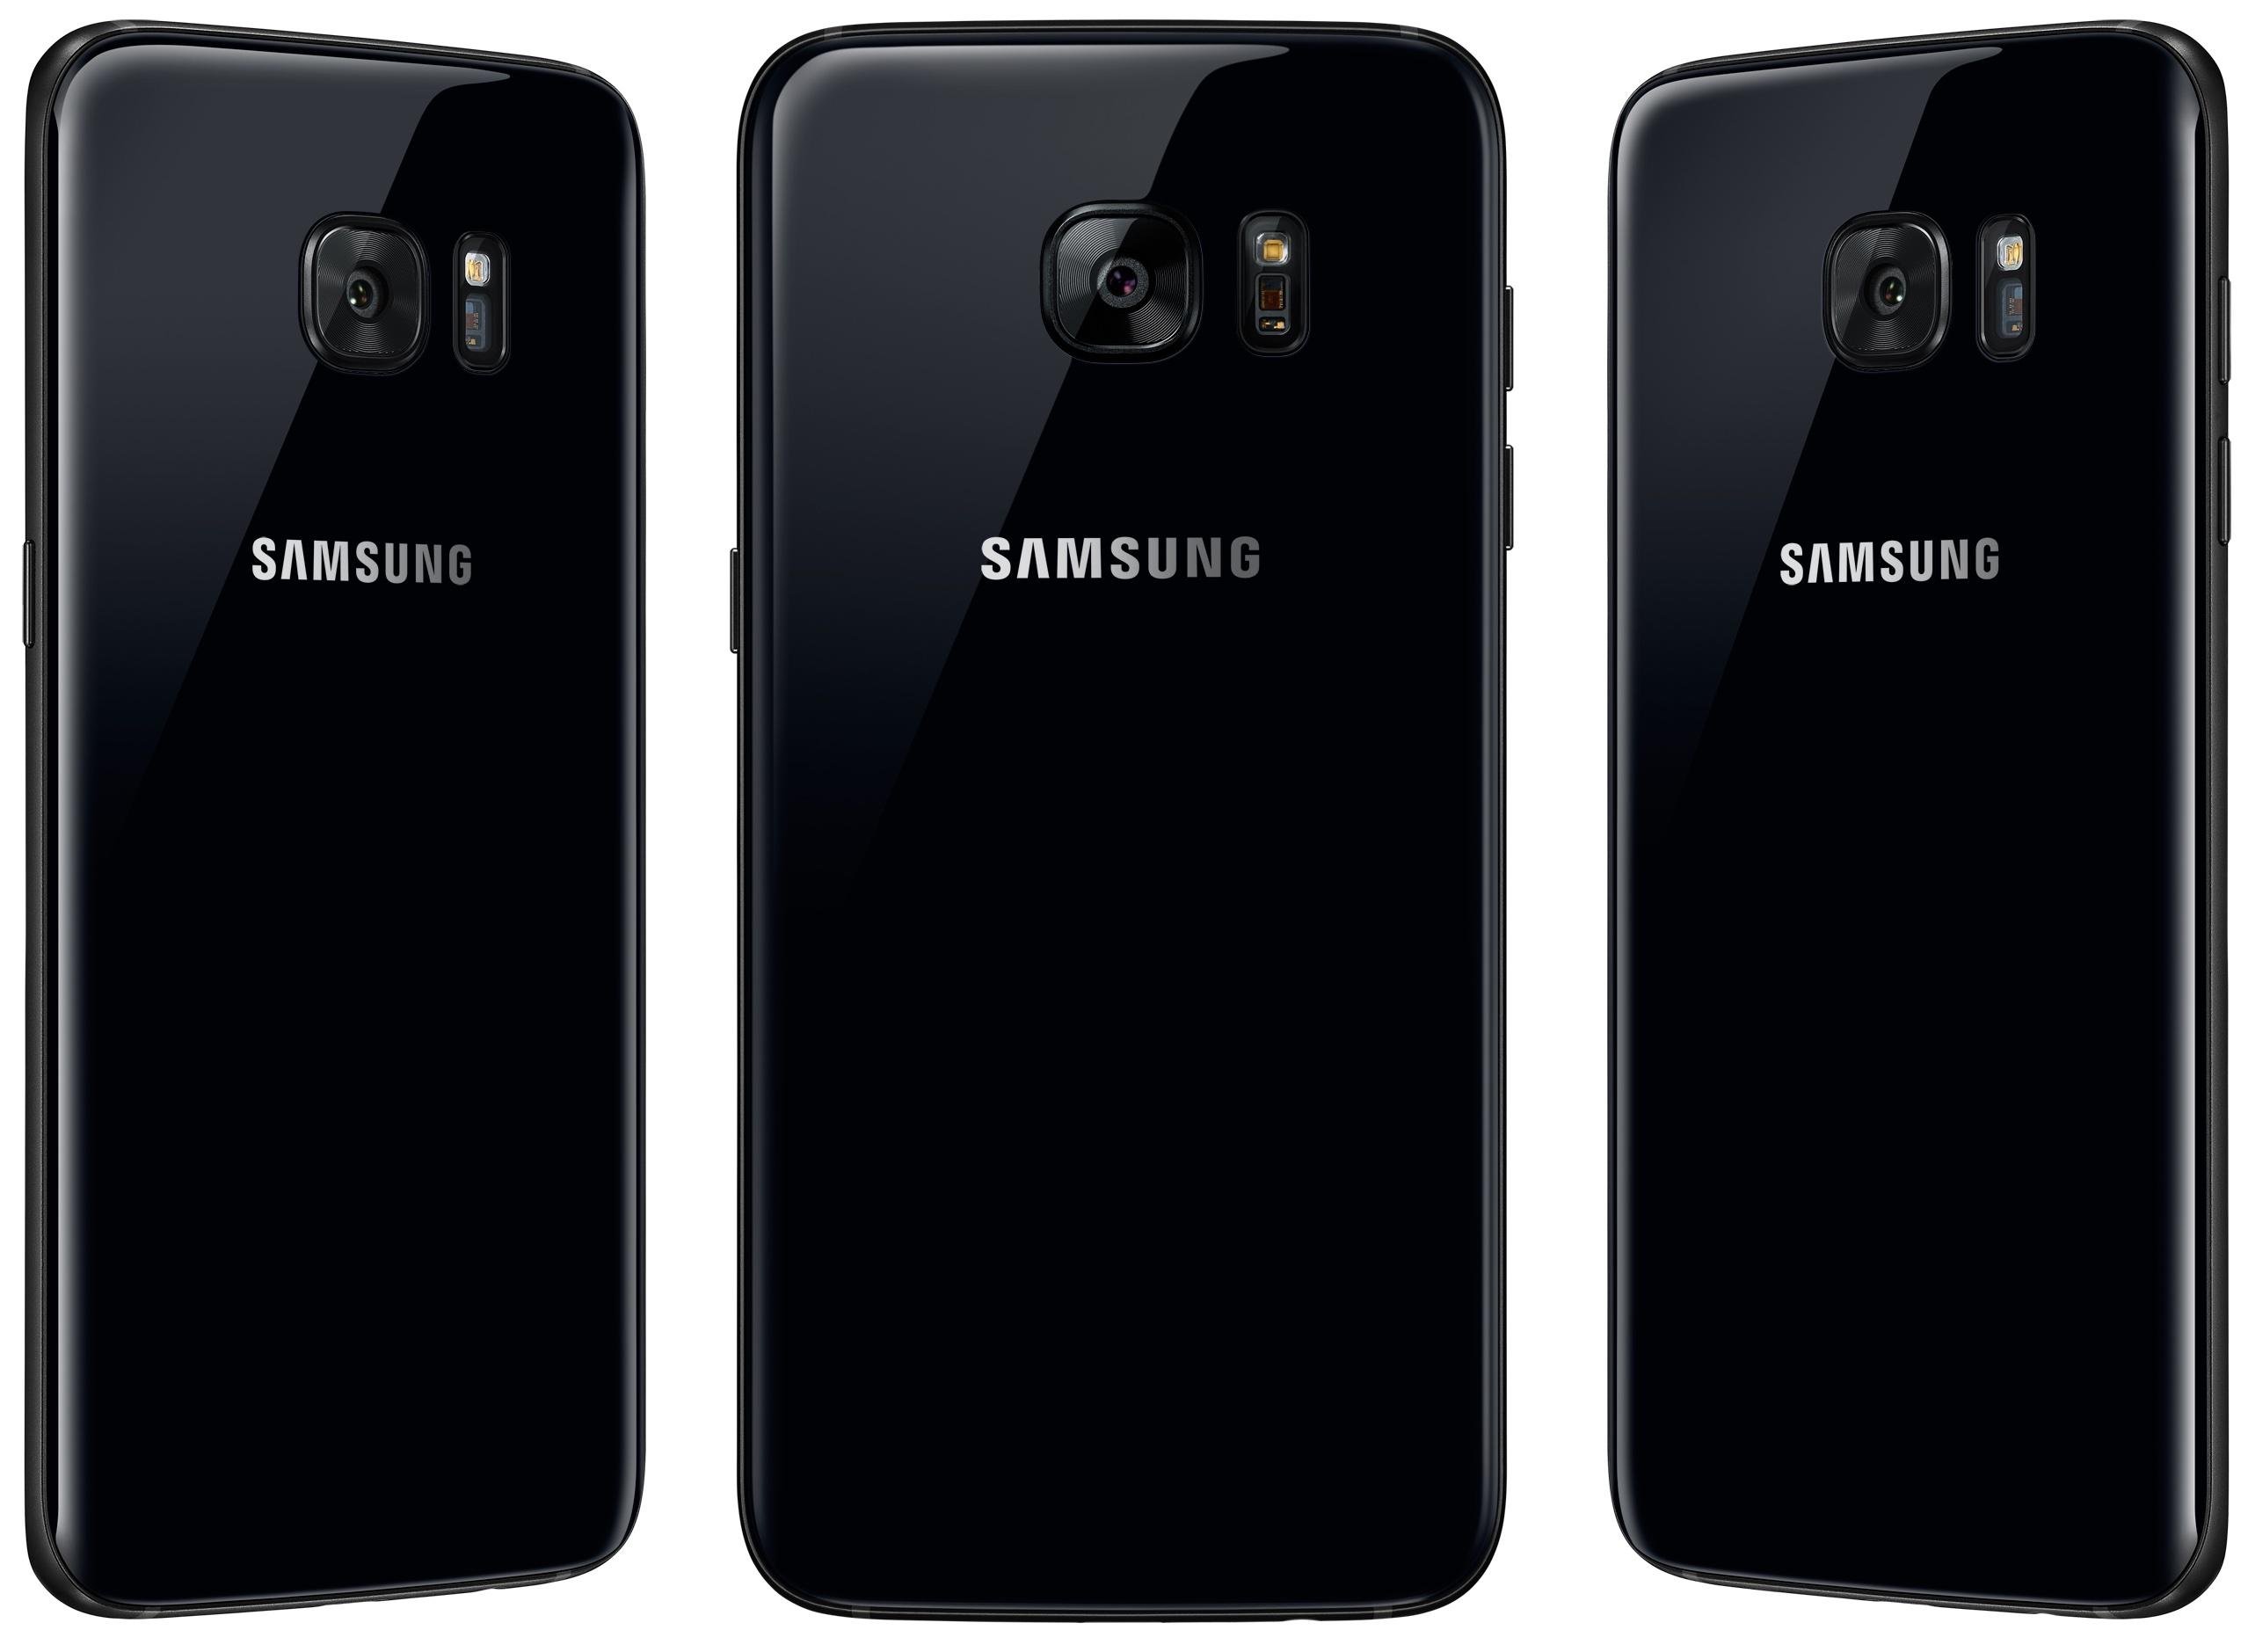 Samsung Galaxy S7 Black Pearl front 002